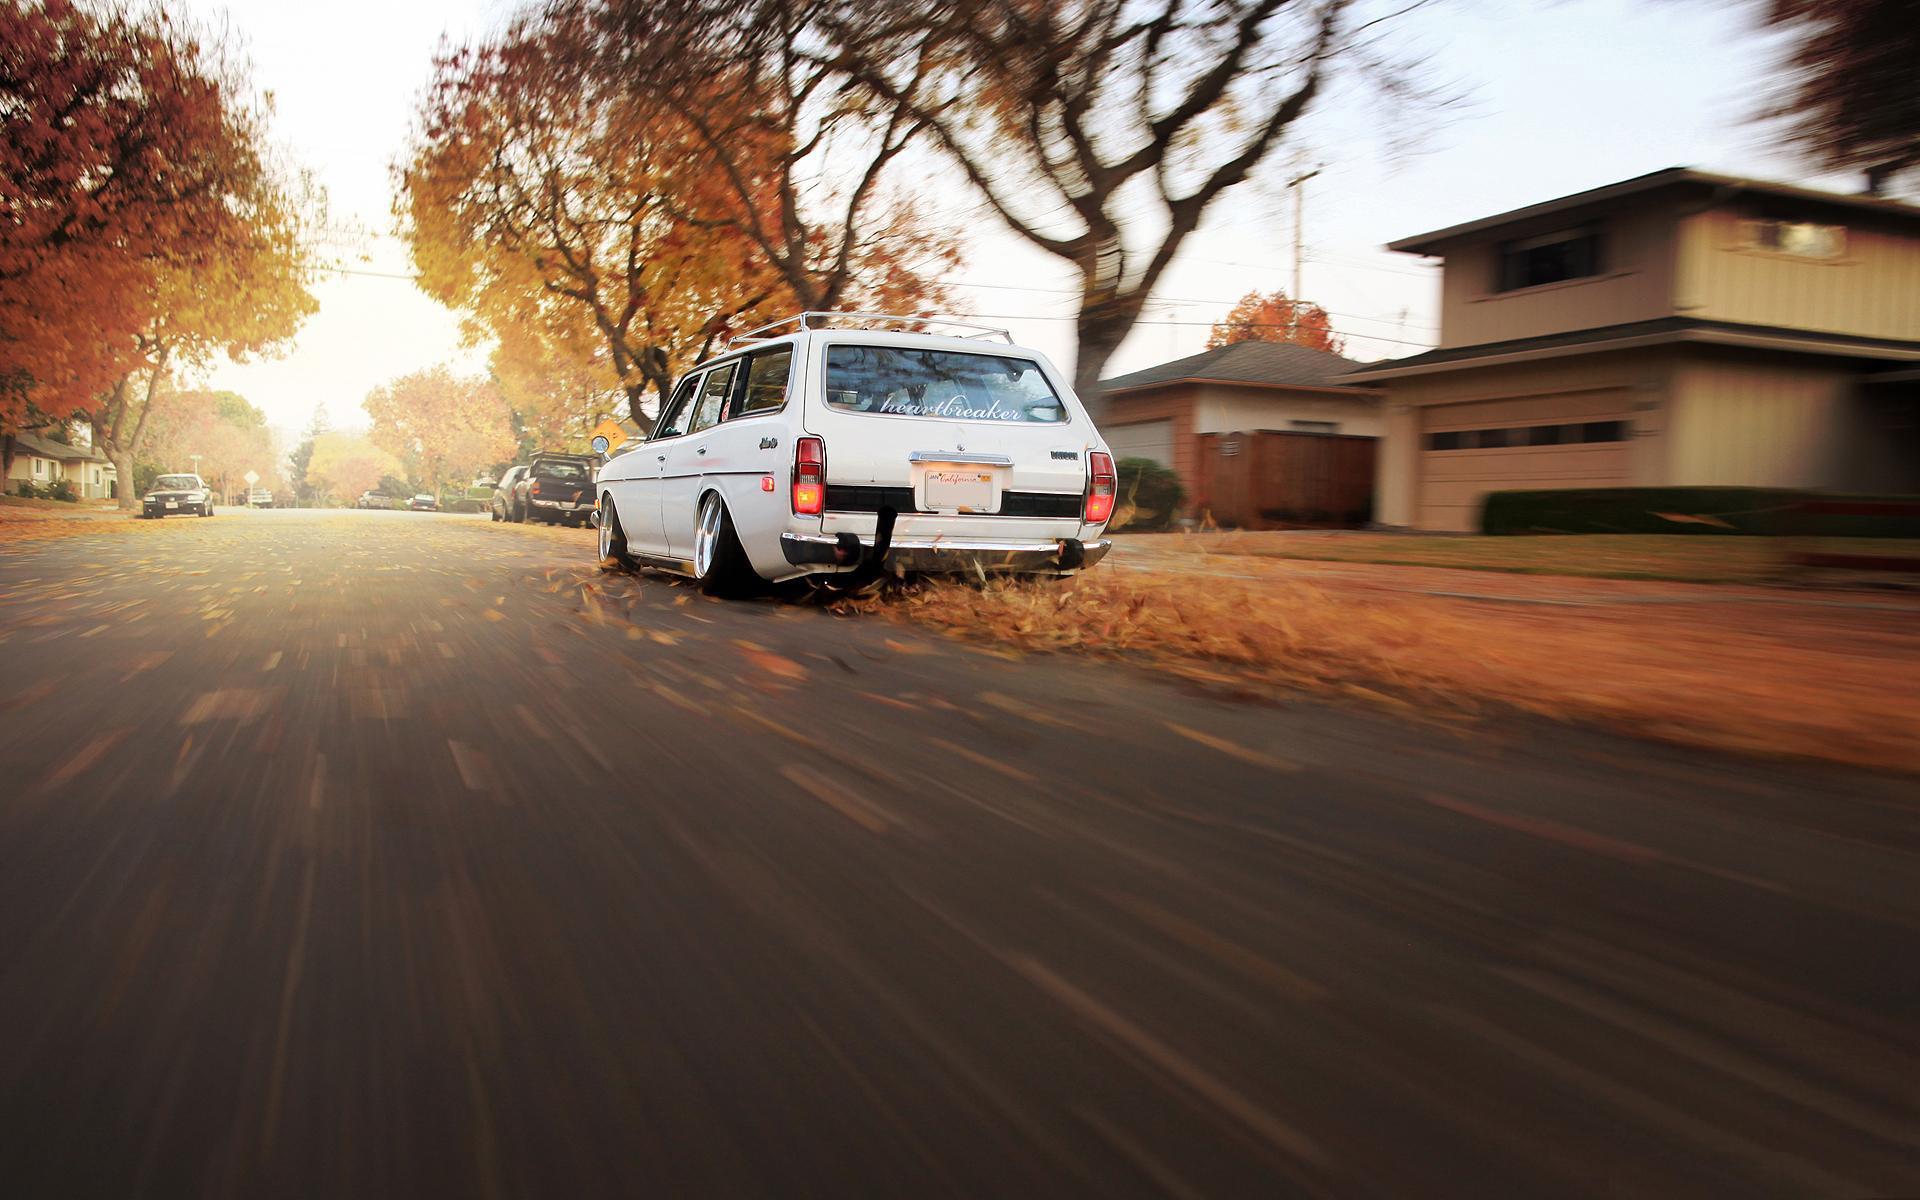 Fahrzeuge - Datsun 610 Wagon  Wallpaper